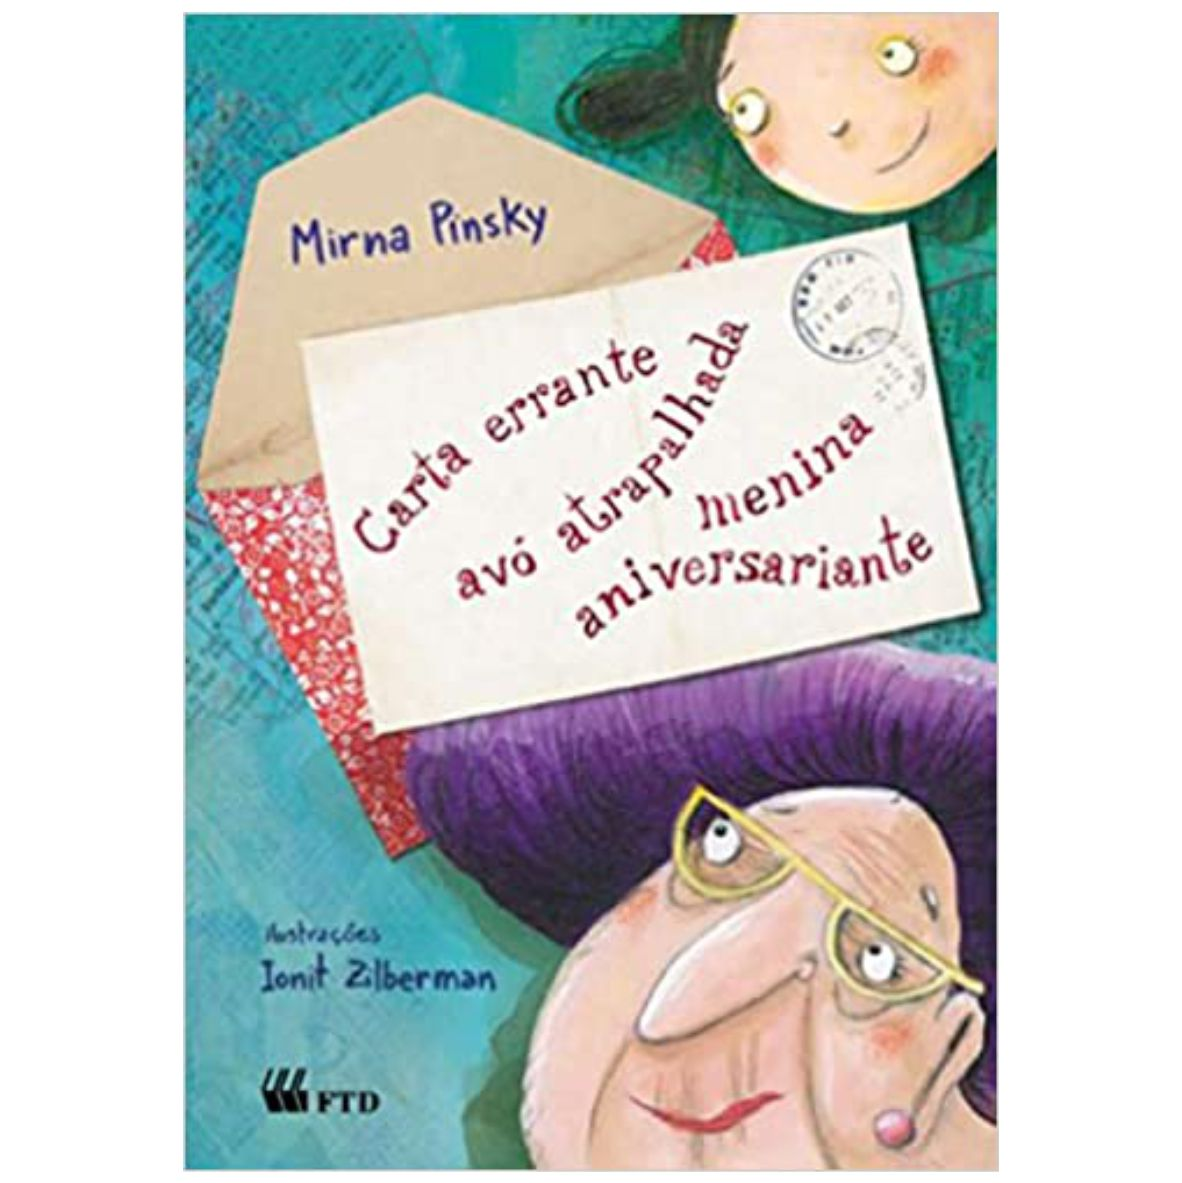 Livro Carta Errante, Avó Atrapalhada, Menina Aniversariante - Editora FTD